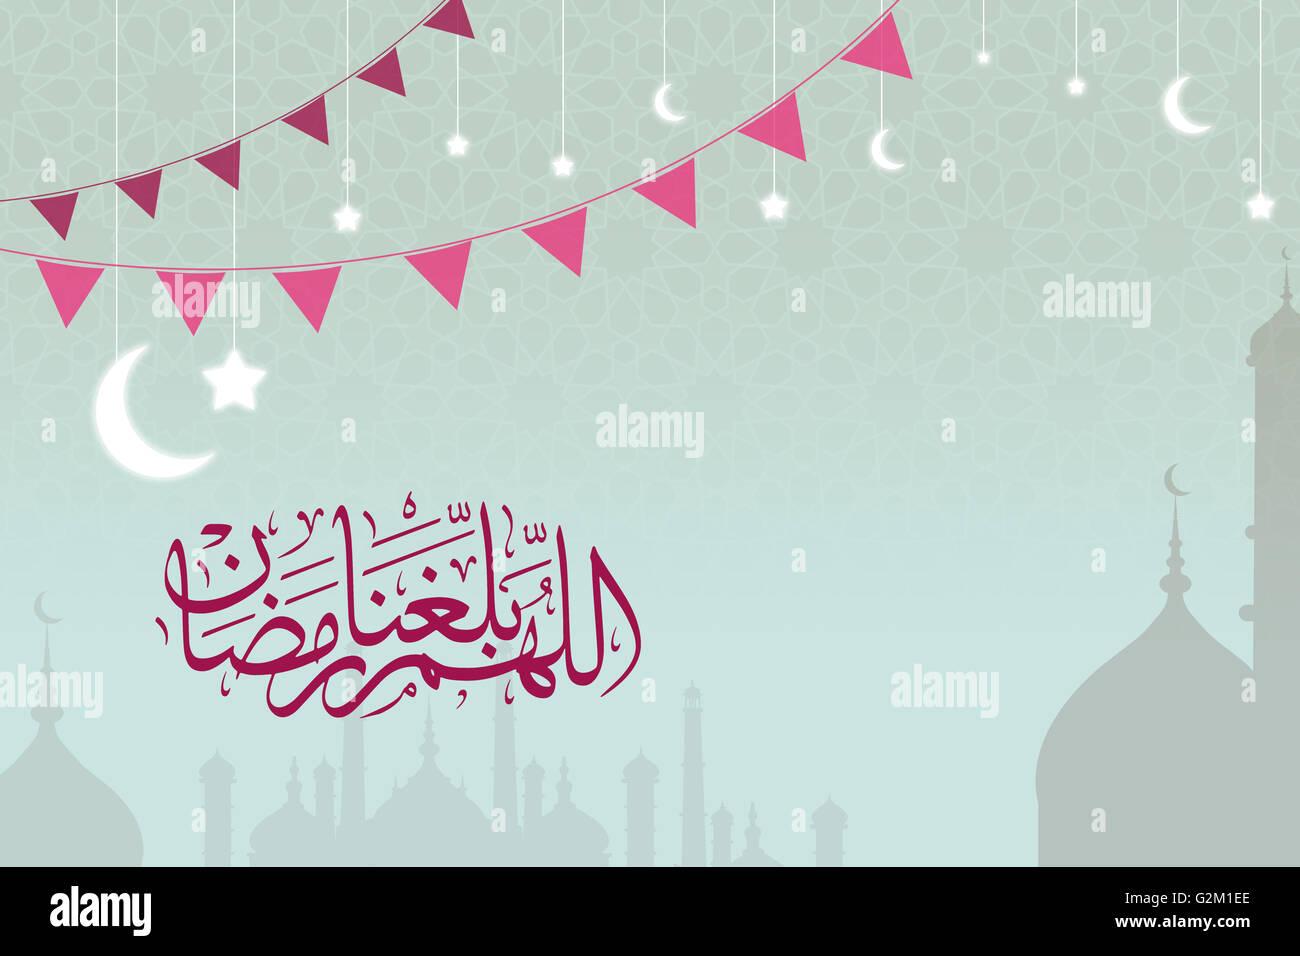 Ramadan greeting card translation may allah make us reach stock ramadan greeting card translation may allah make us reach ramadan kristyandbryce Image collections